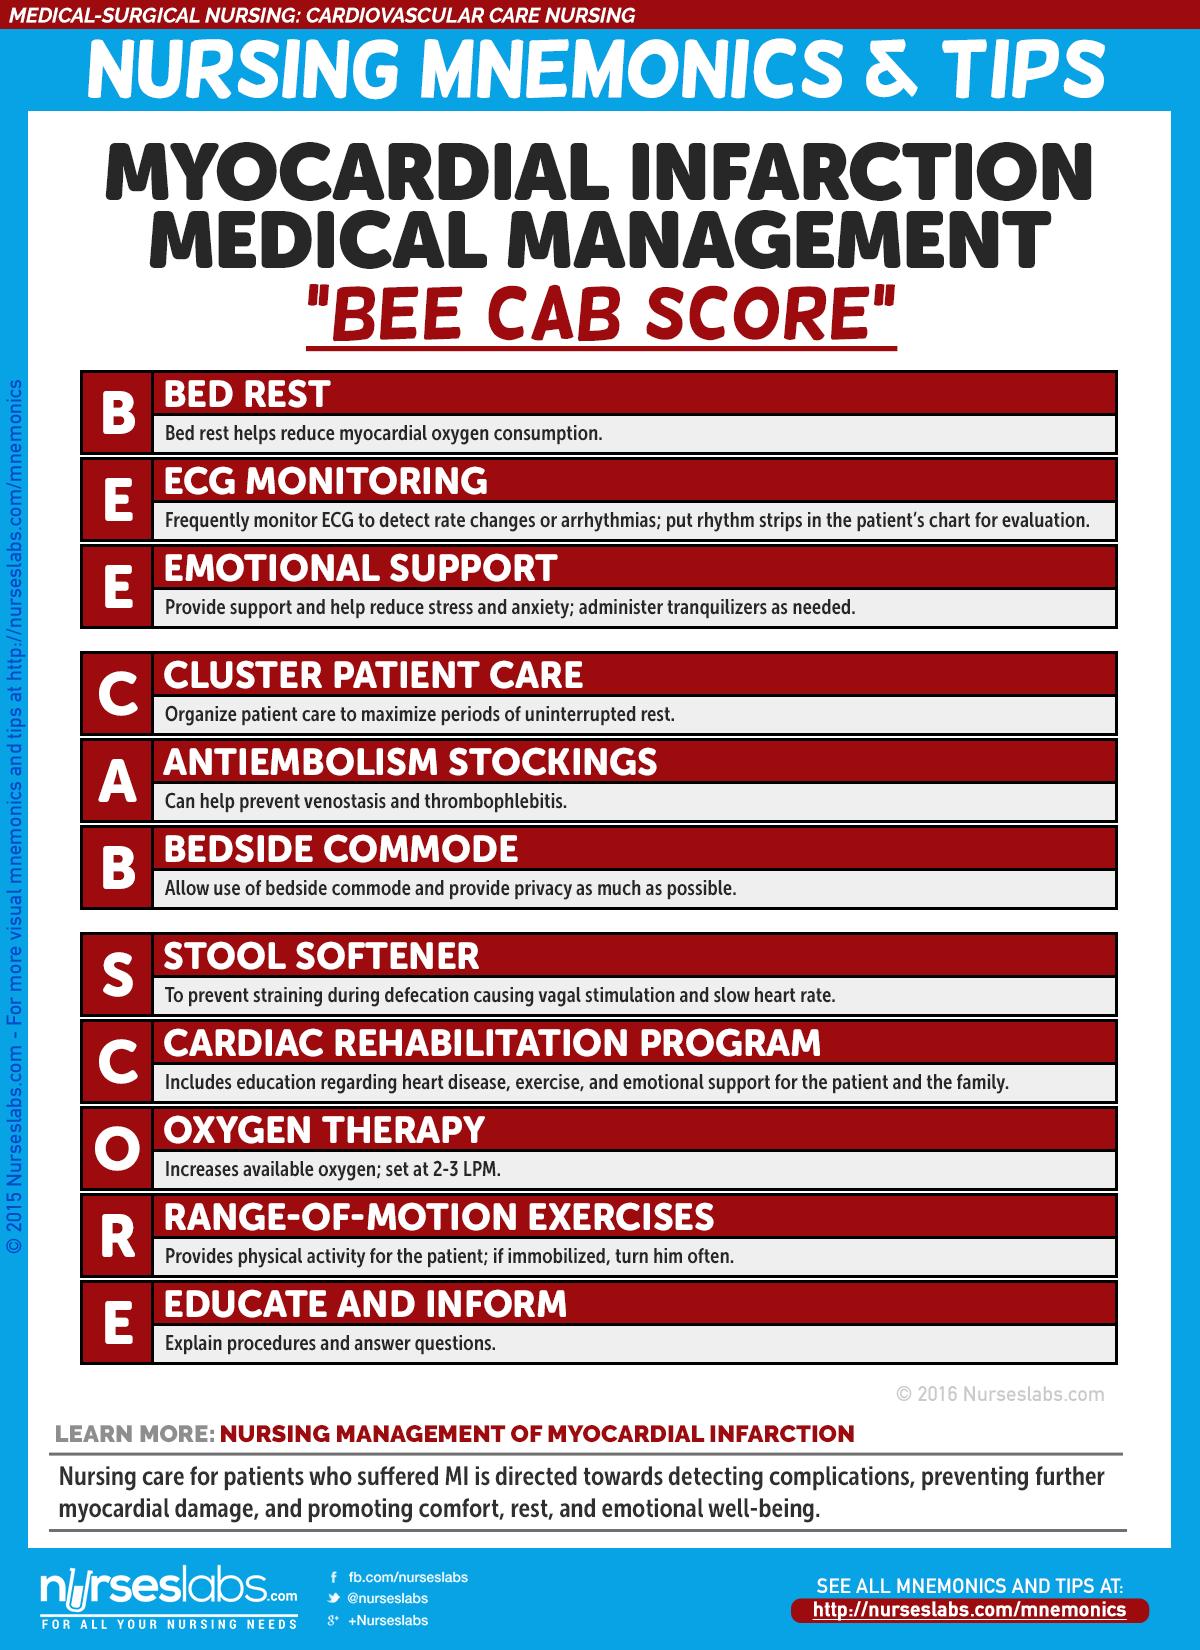 Cardiovascular Care Nursing Mnemonics And Tips